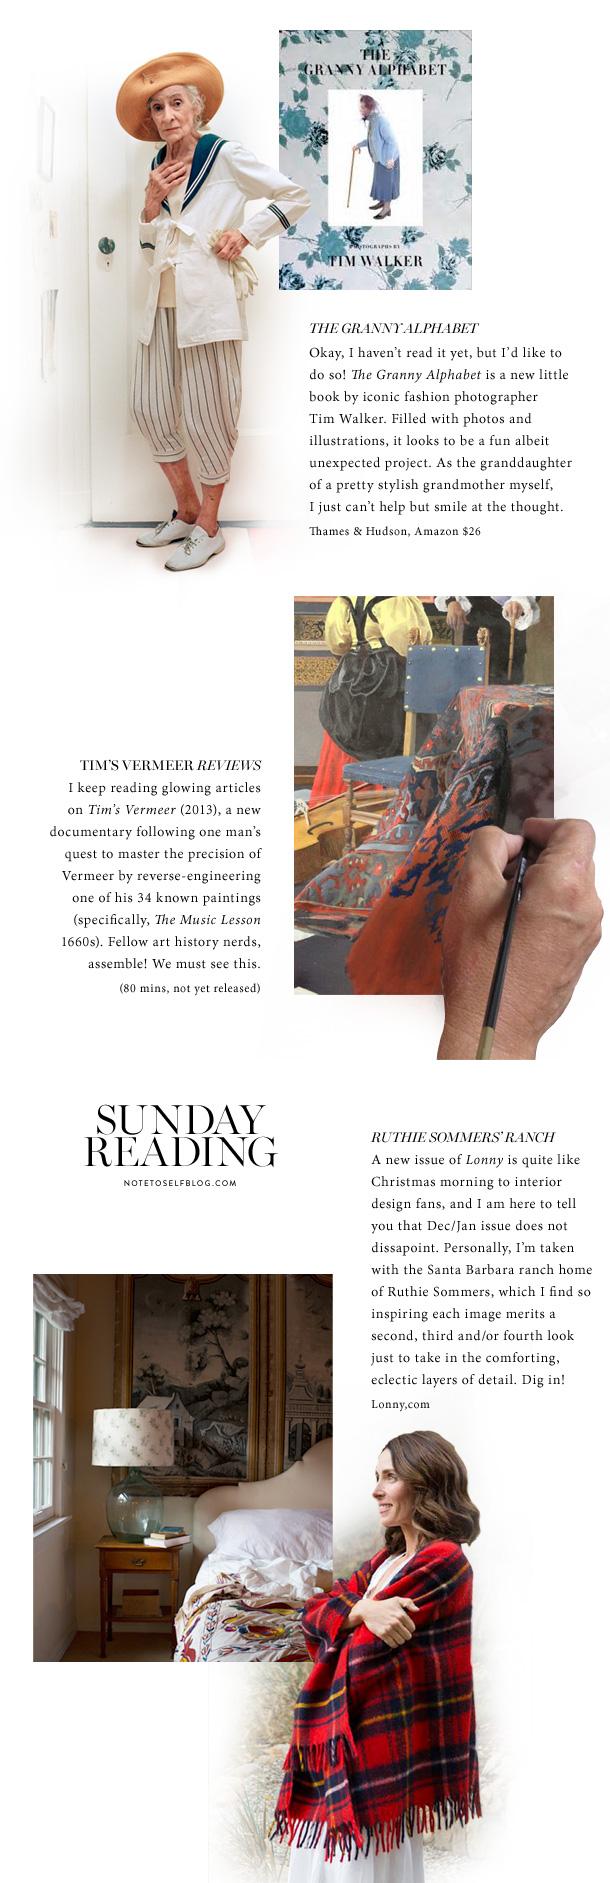 SundayReading-Dec1.jpg